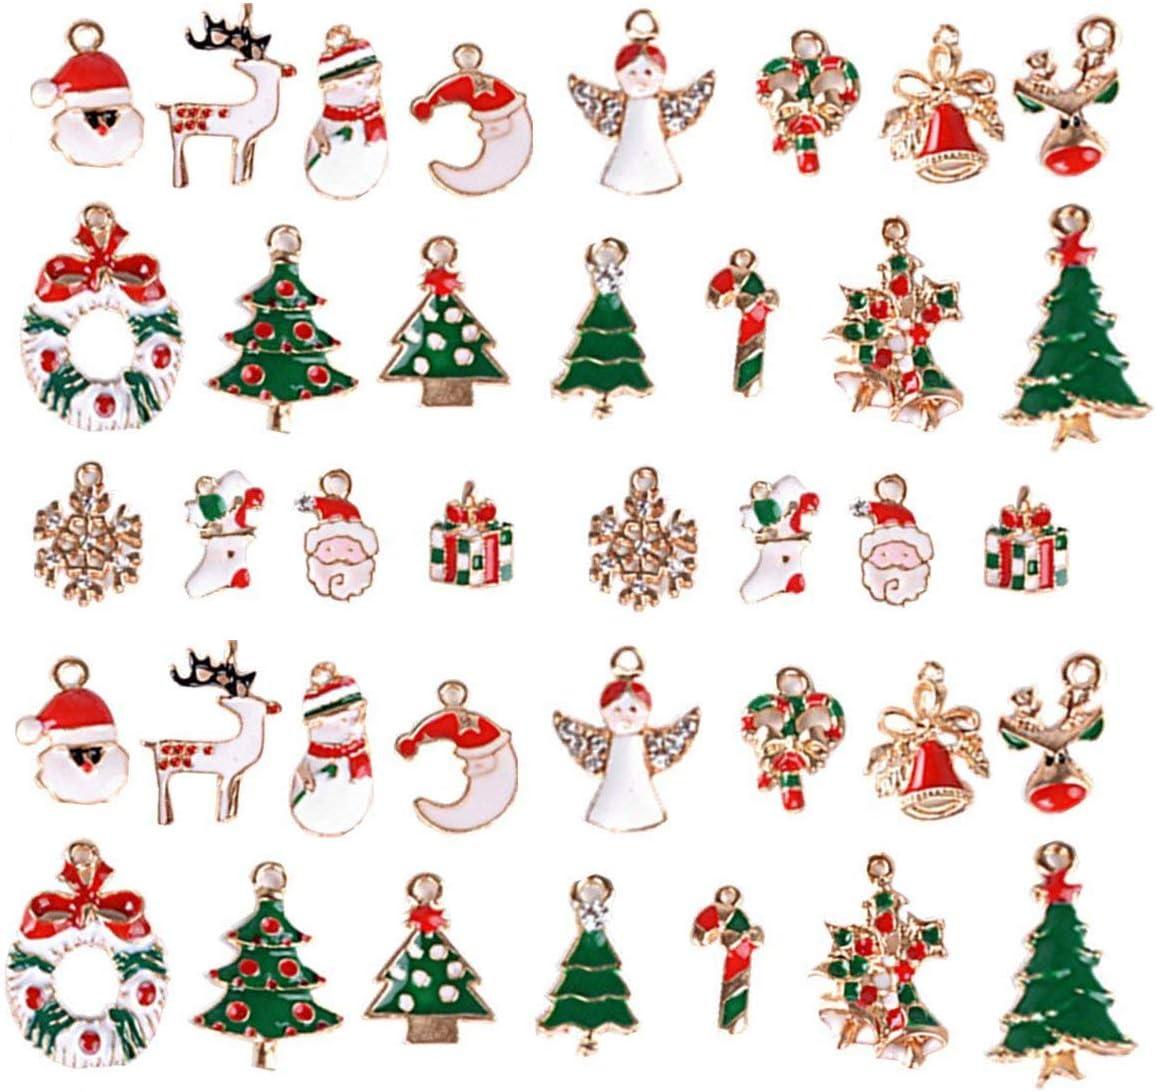 40 pcs Mixte Charm Pendentifs Pour Noël